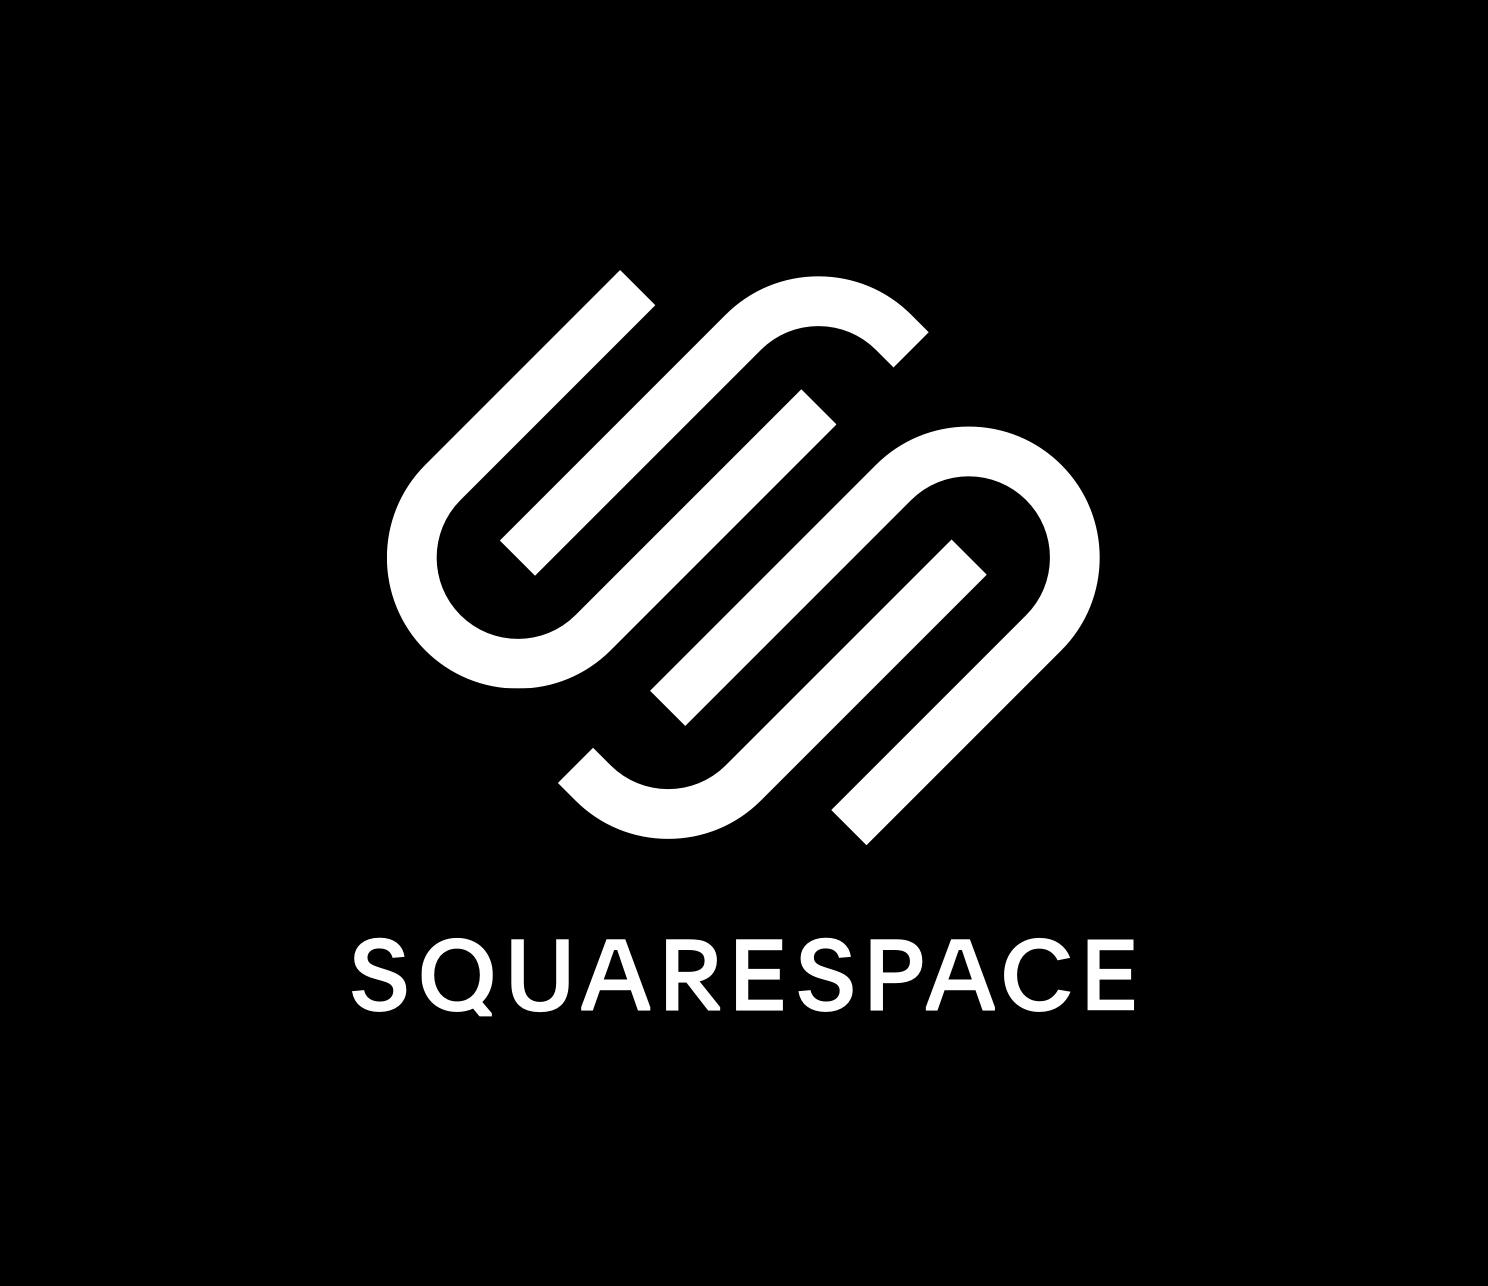 squarespace-logo-tertiary-white.jpg